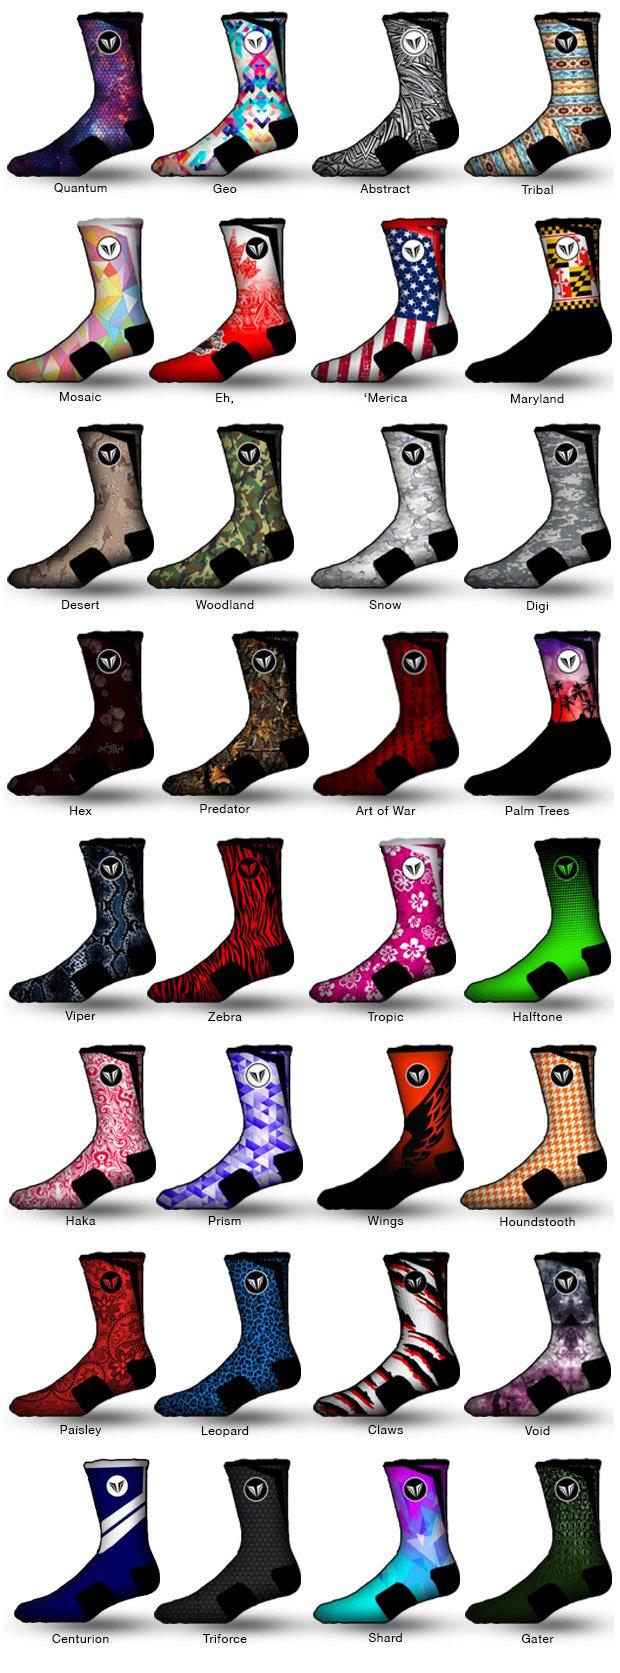 Vision Wear Athletic Socks